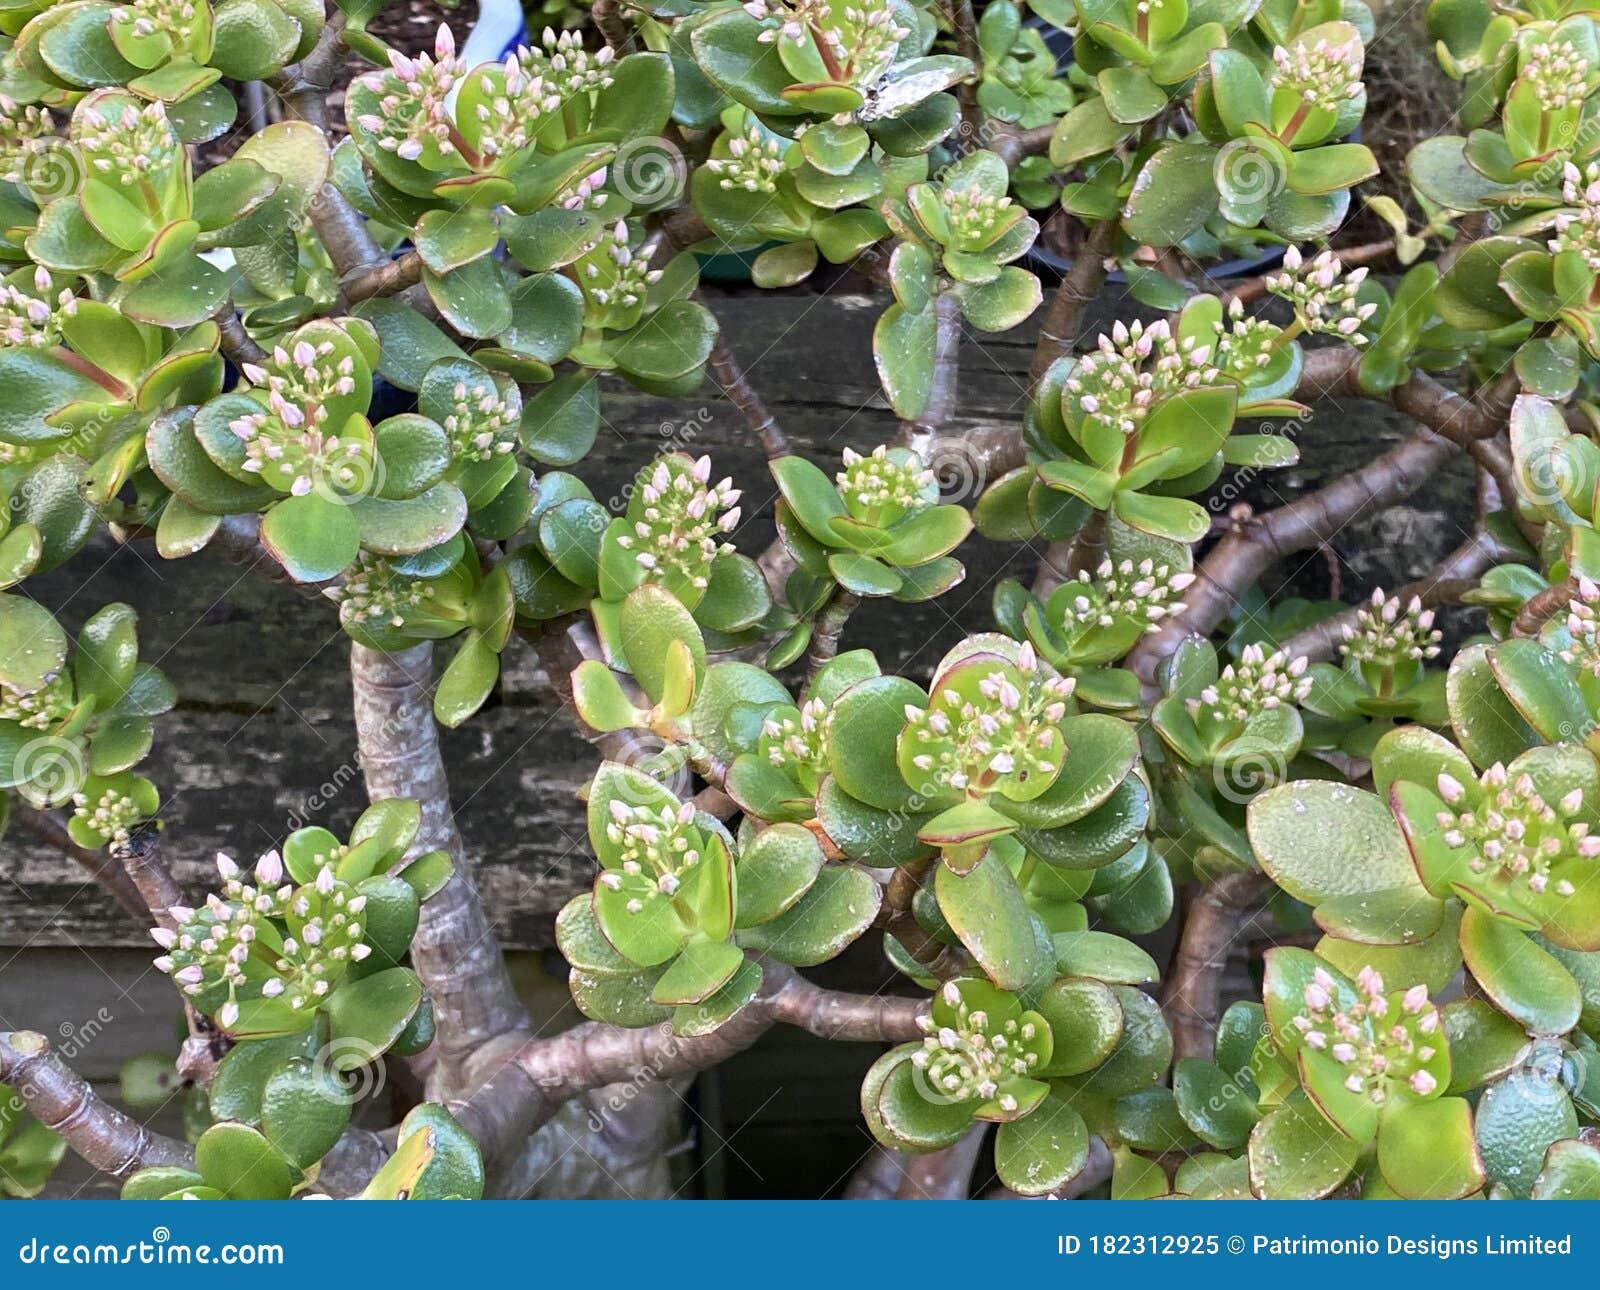 Crassula ovata, jade plant, lucky plant, money plant Photo